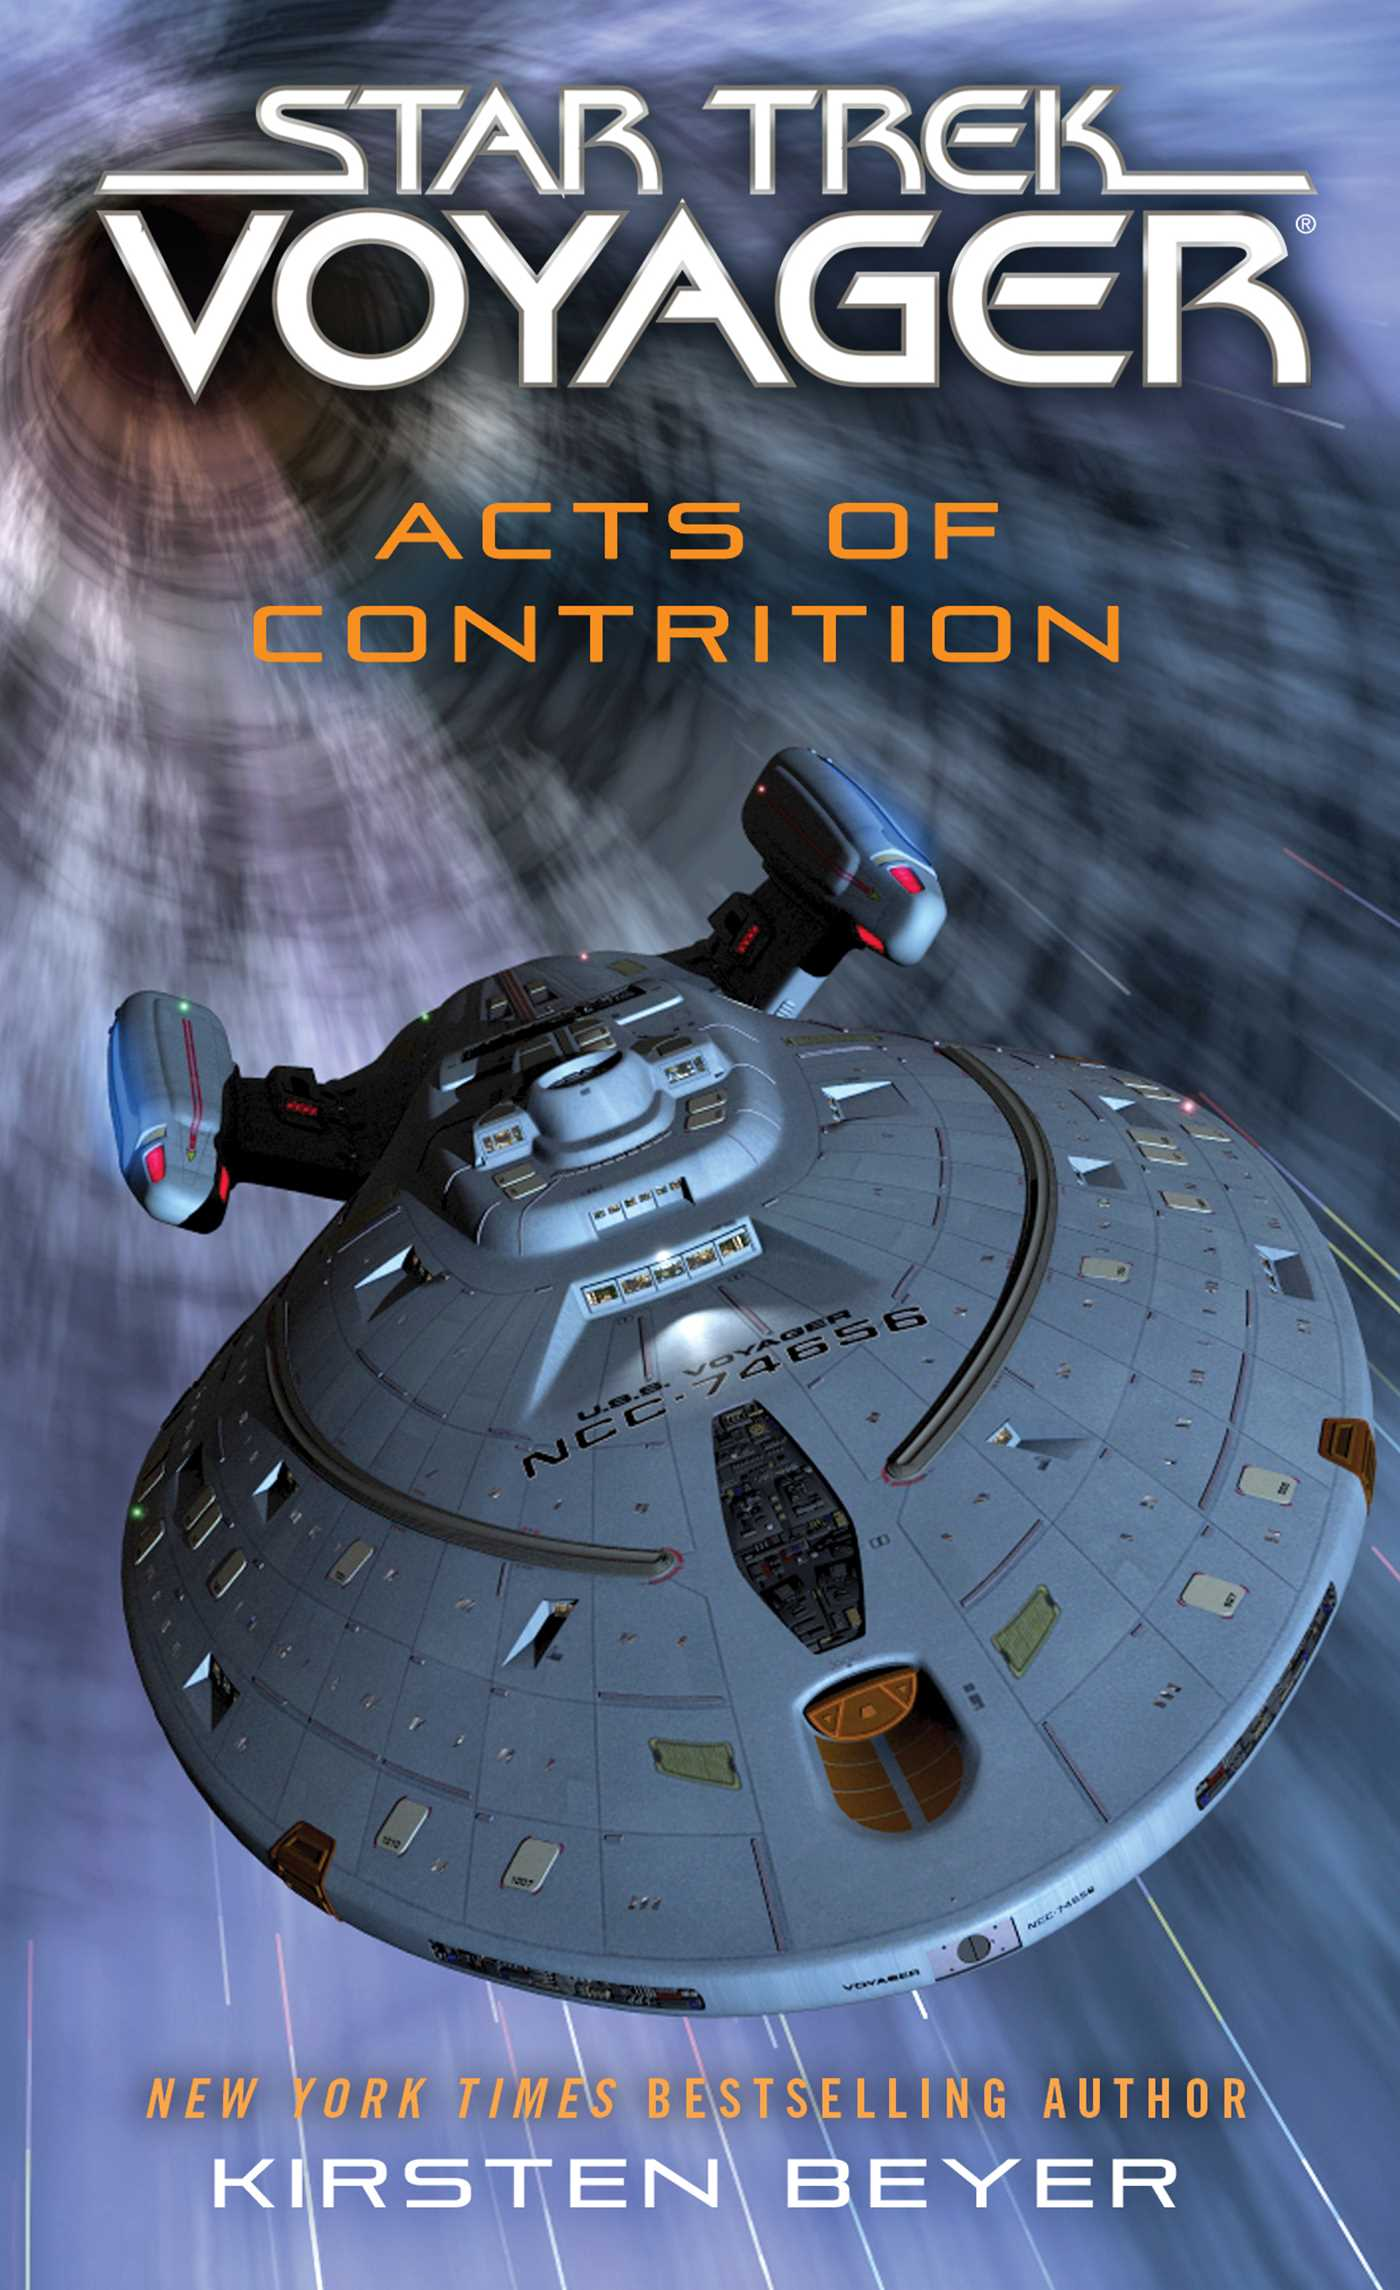 Star trek voyager acts of contrition 9781476765518 hr